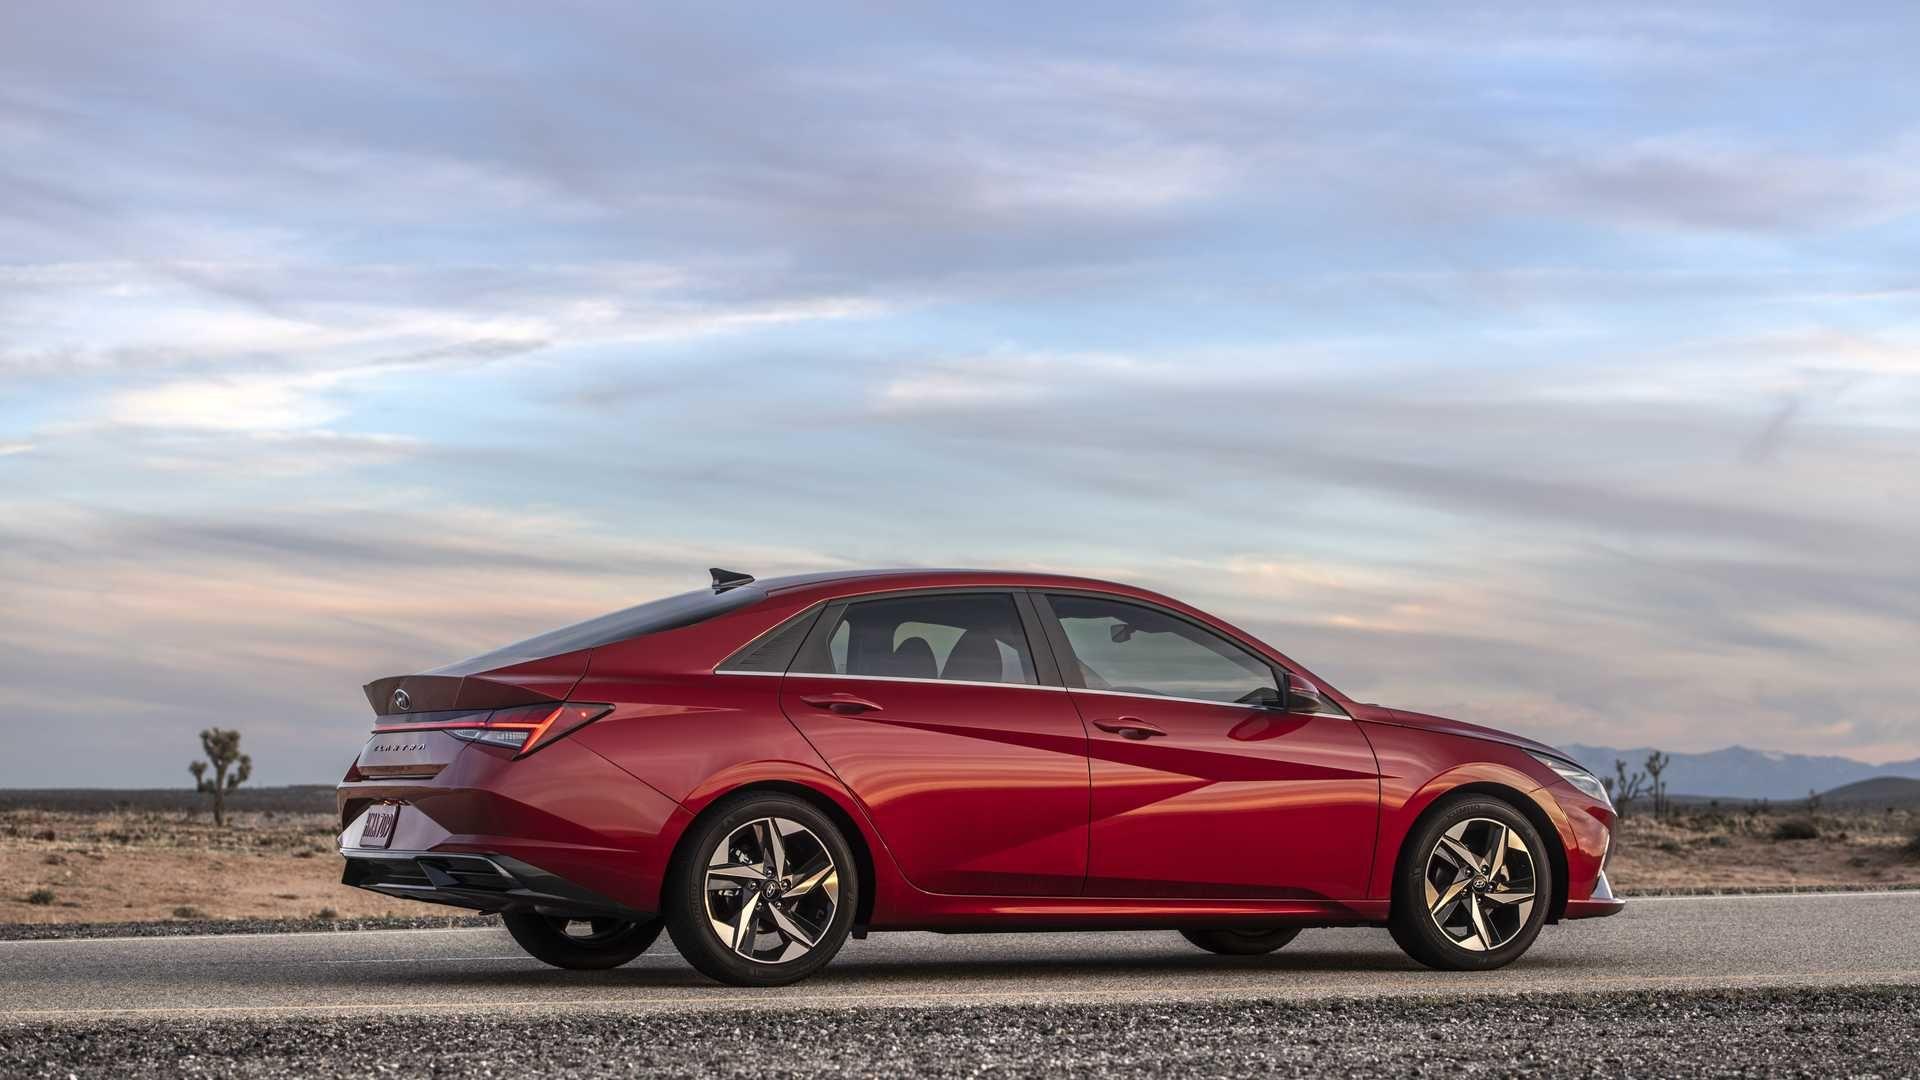 2021 Hyundai Elantra Debuts With Bigger Size Upmarket Tech In 2020 Hyundai Elantra Elantra Hyundai